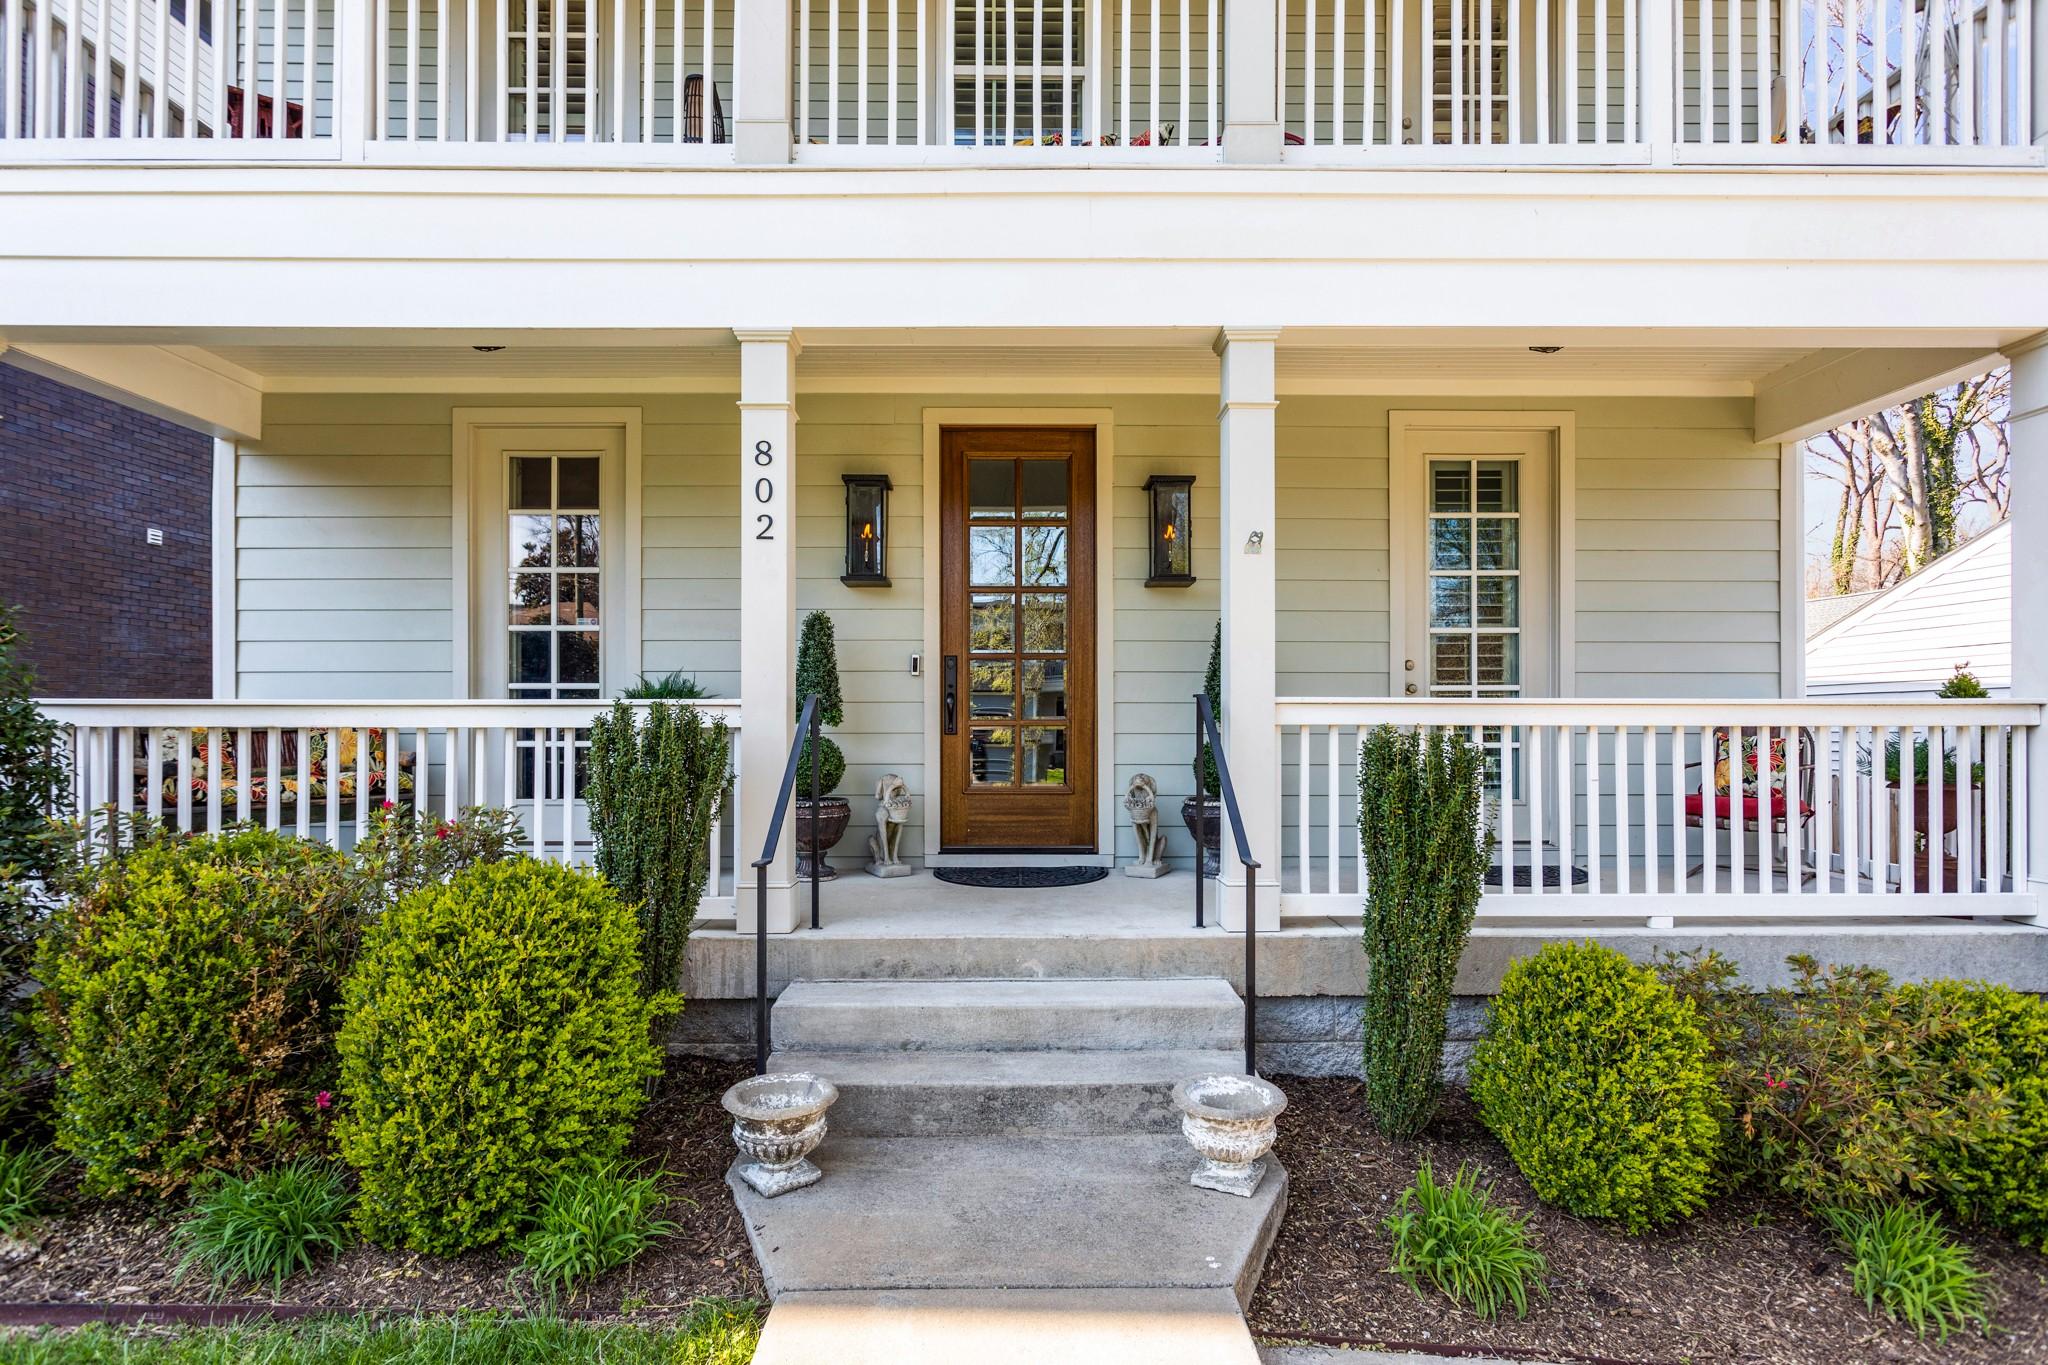 802 Montrose Ave Property Photo - Nashville, TN real estate listing